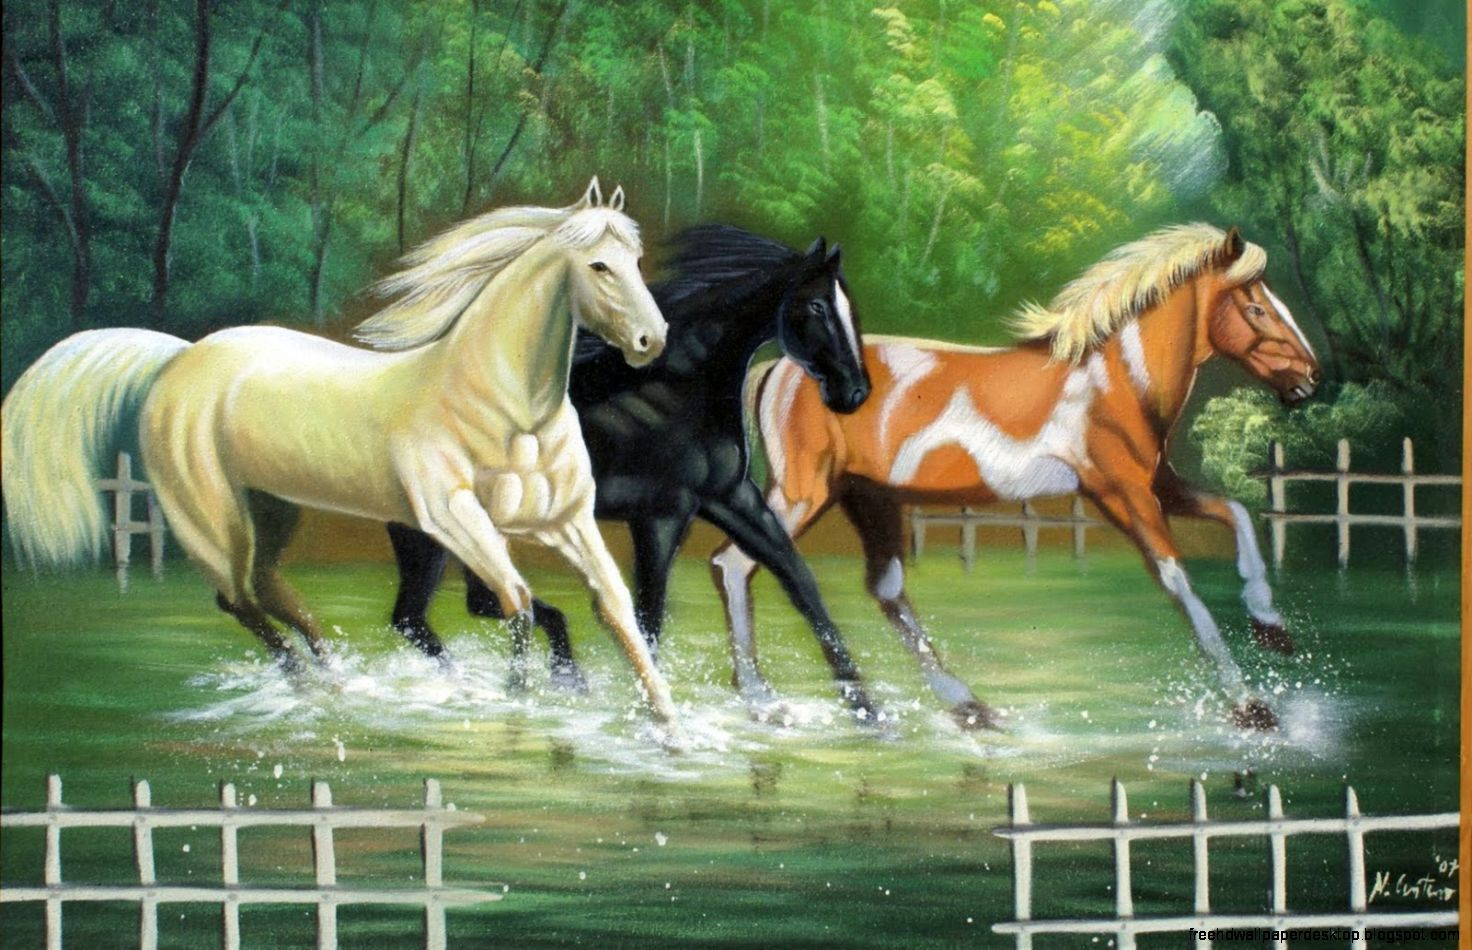 Popular   Wallpaper Horse Art - horse-painting-wallpapers-horse-painting-images-cool-wallpapers  Image_8310098.jpg